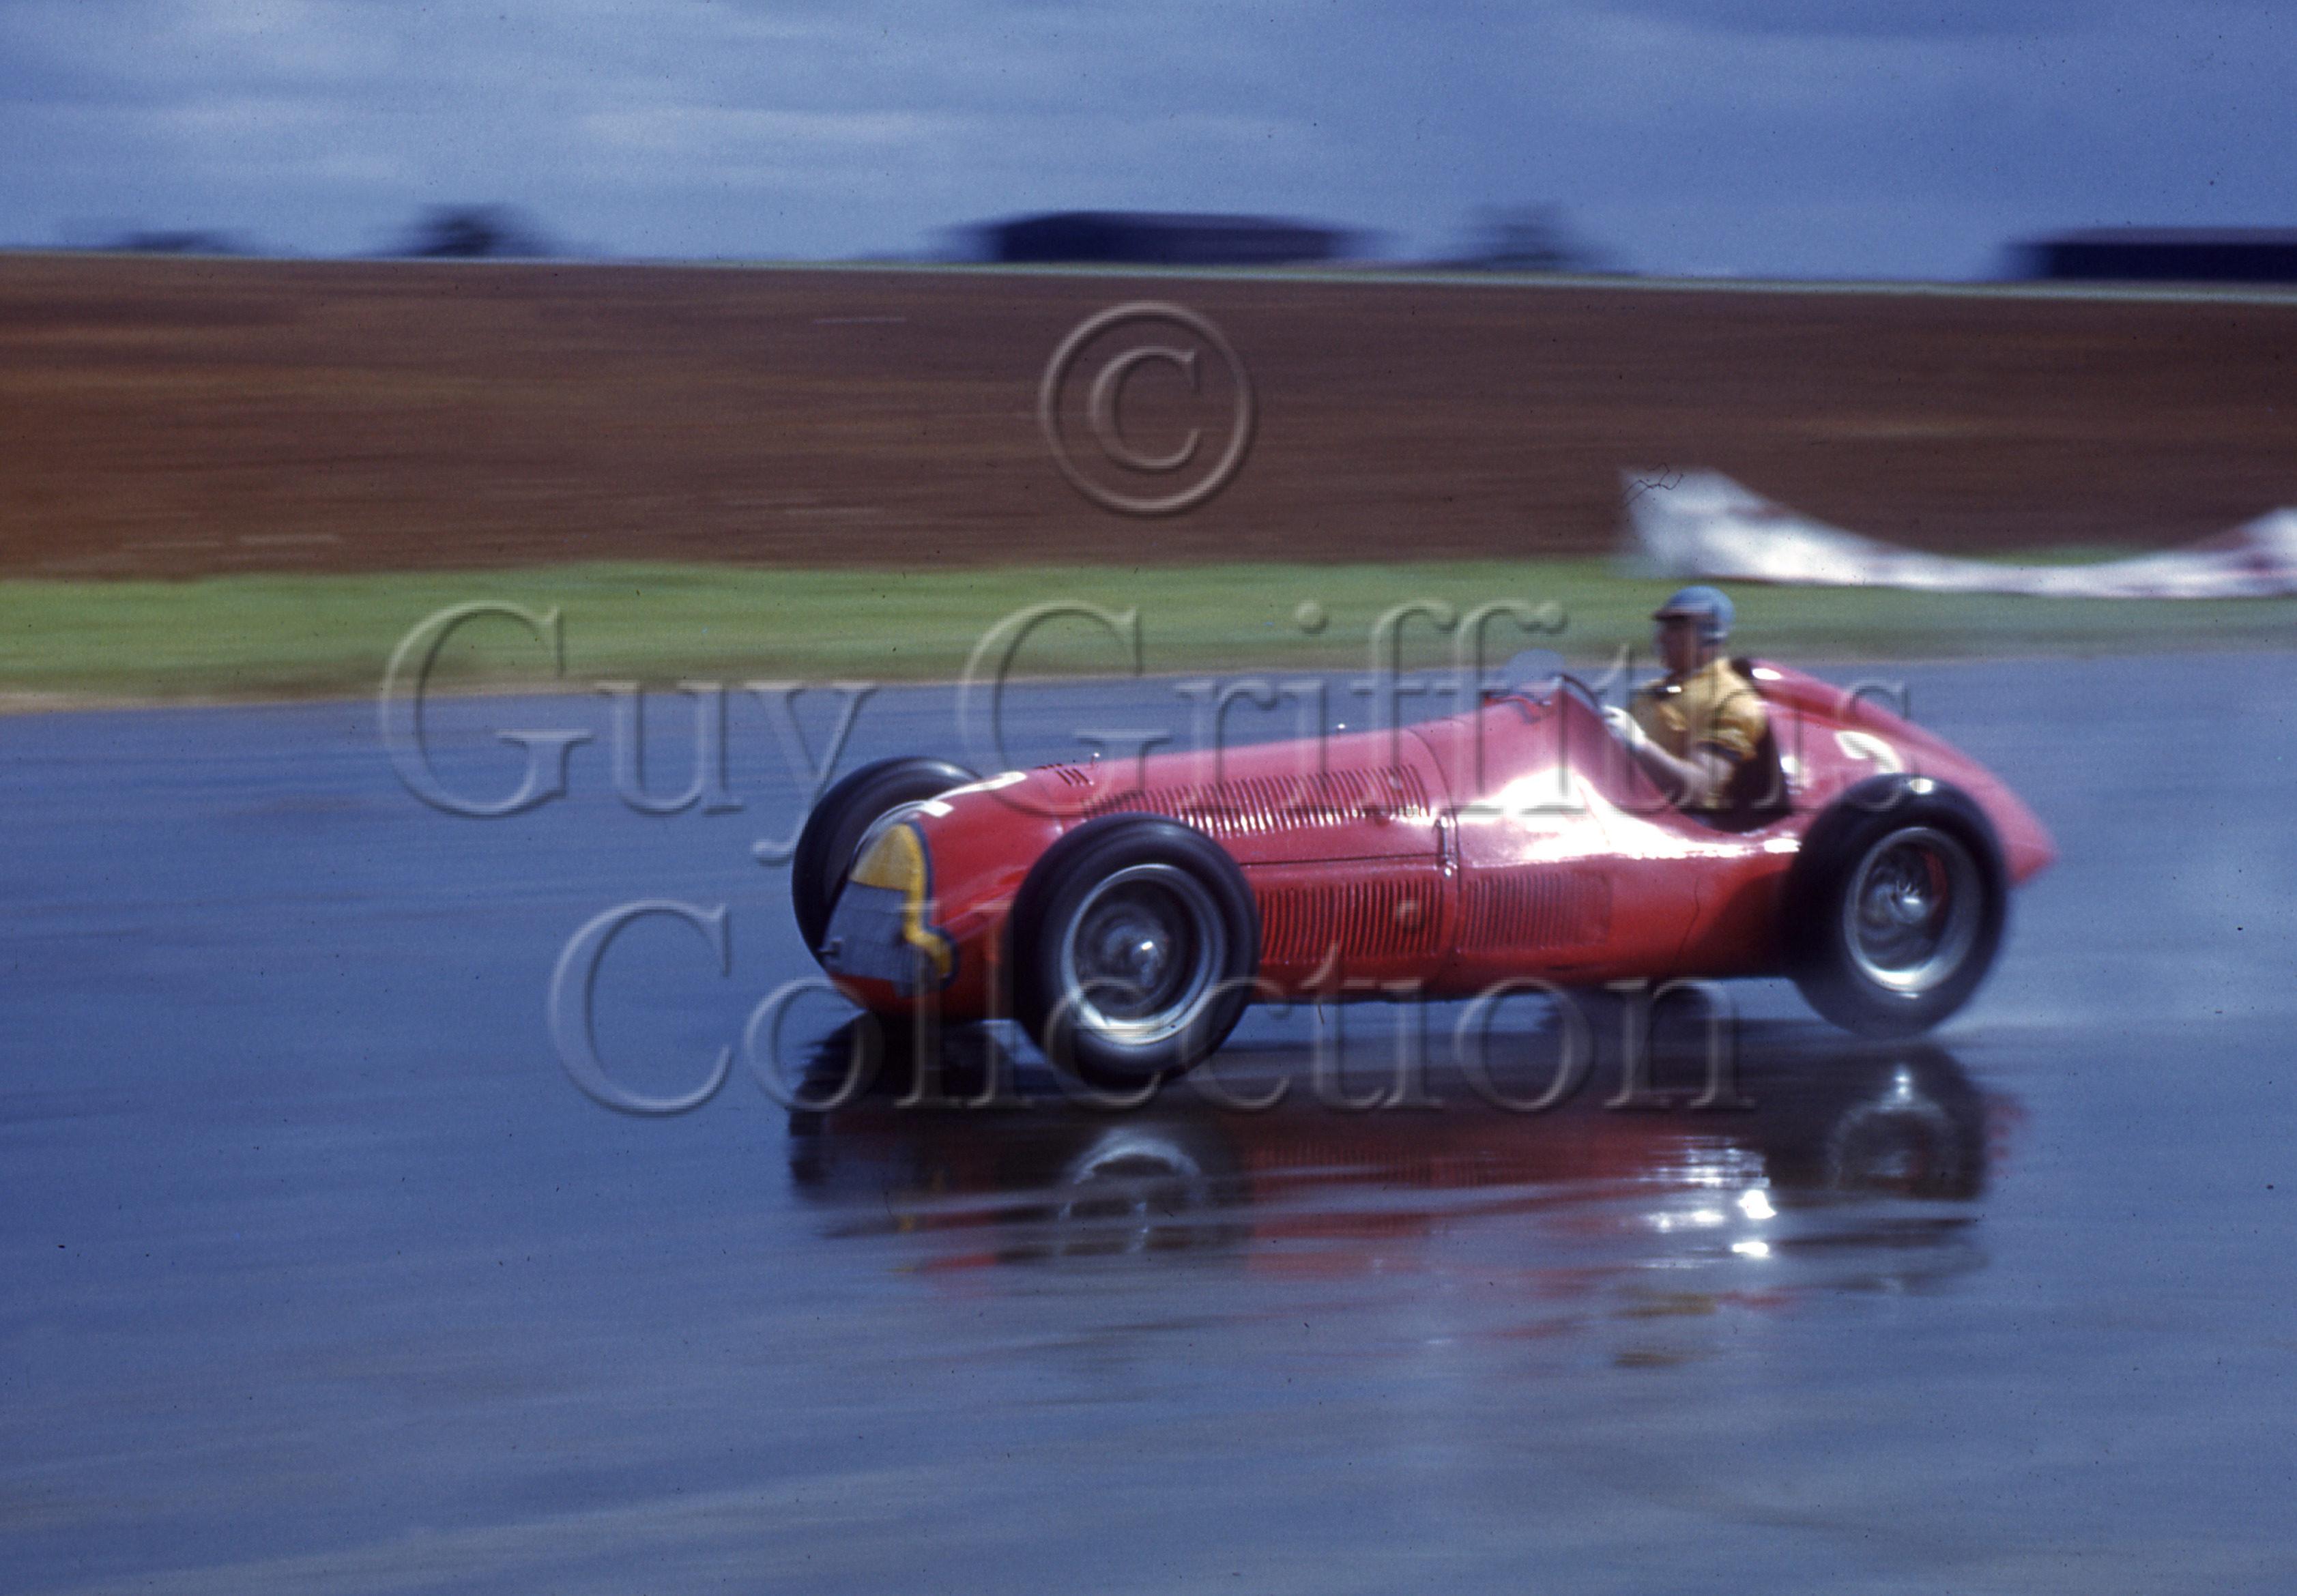 C-3-29–J-Fangio–Alfa-Romeo-158–Silverstone–26-08-1950.jpg - Guy Griffiths Collection